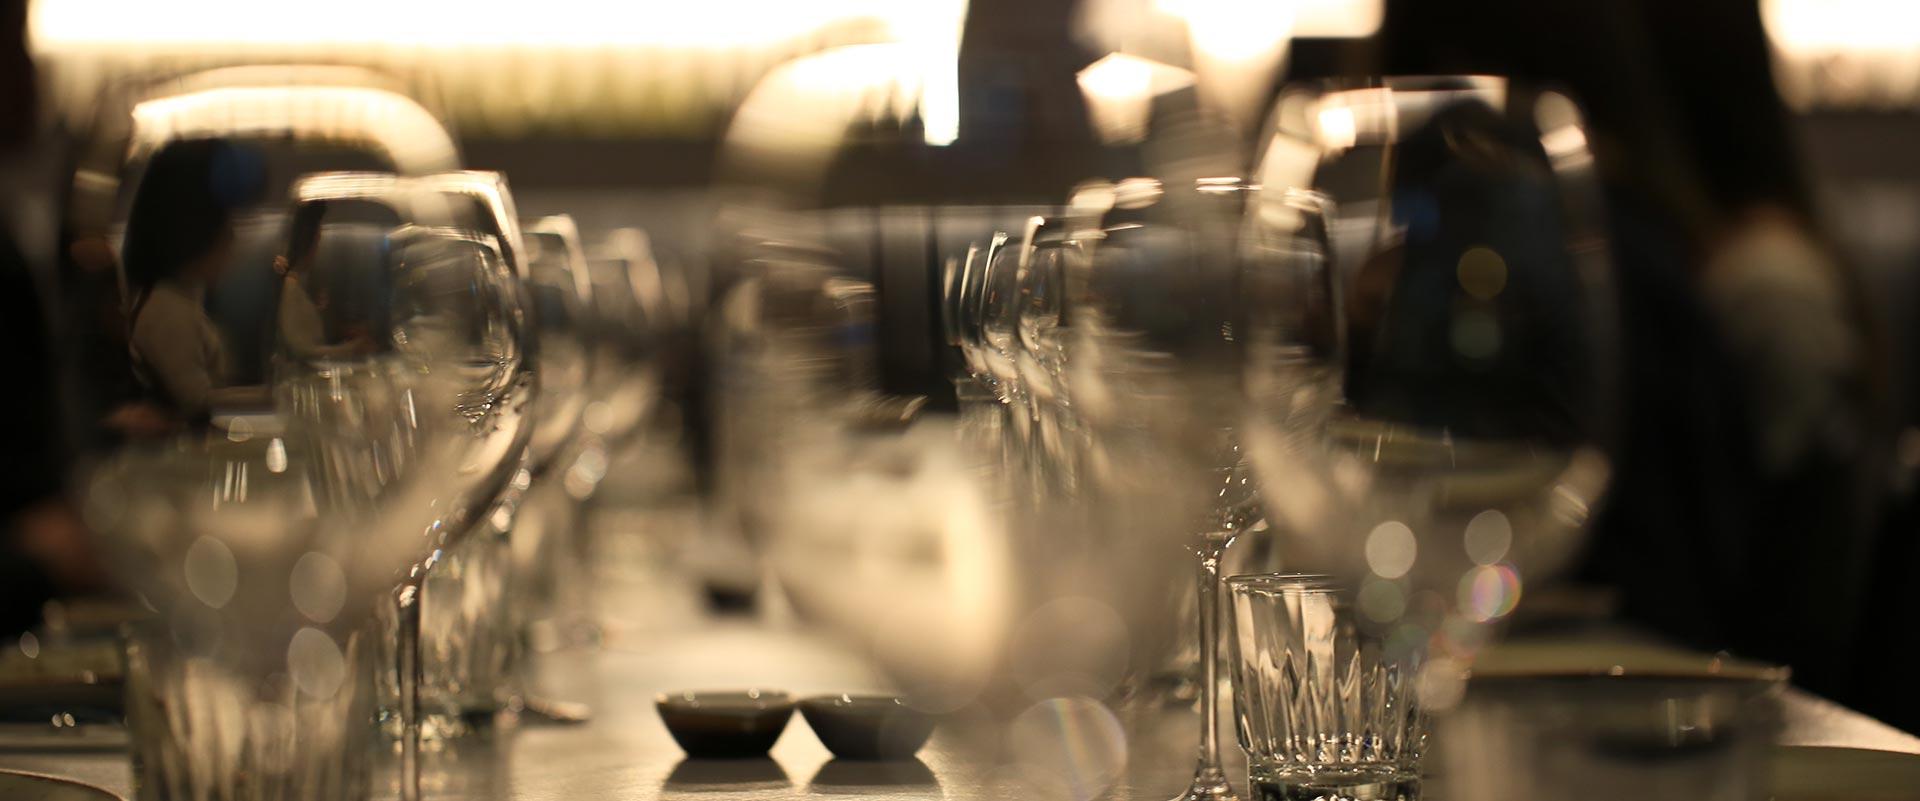 tips-hiring-mobile-bar-glassware